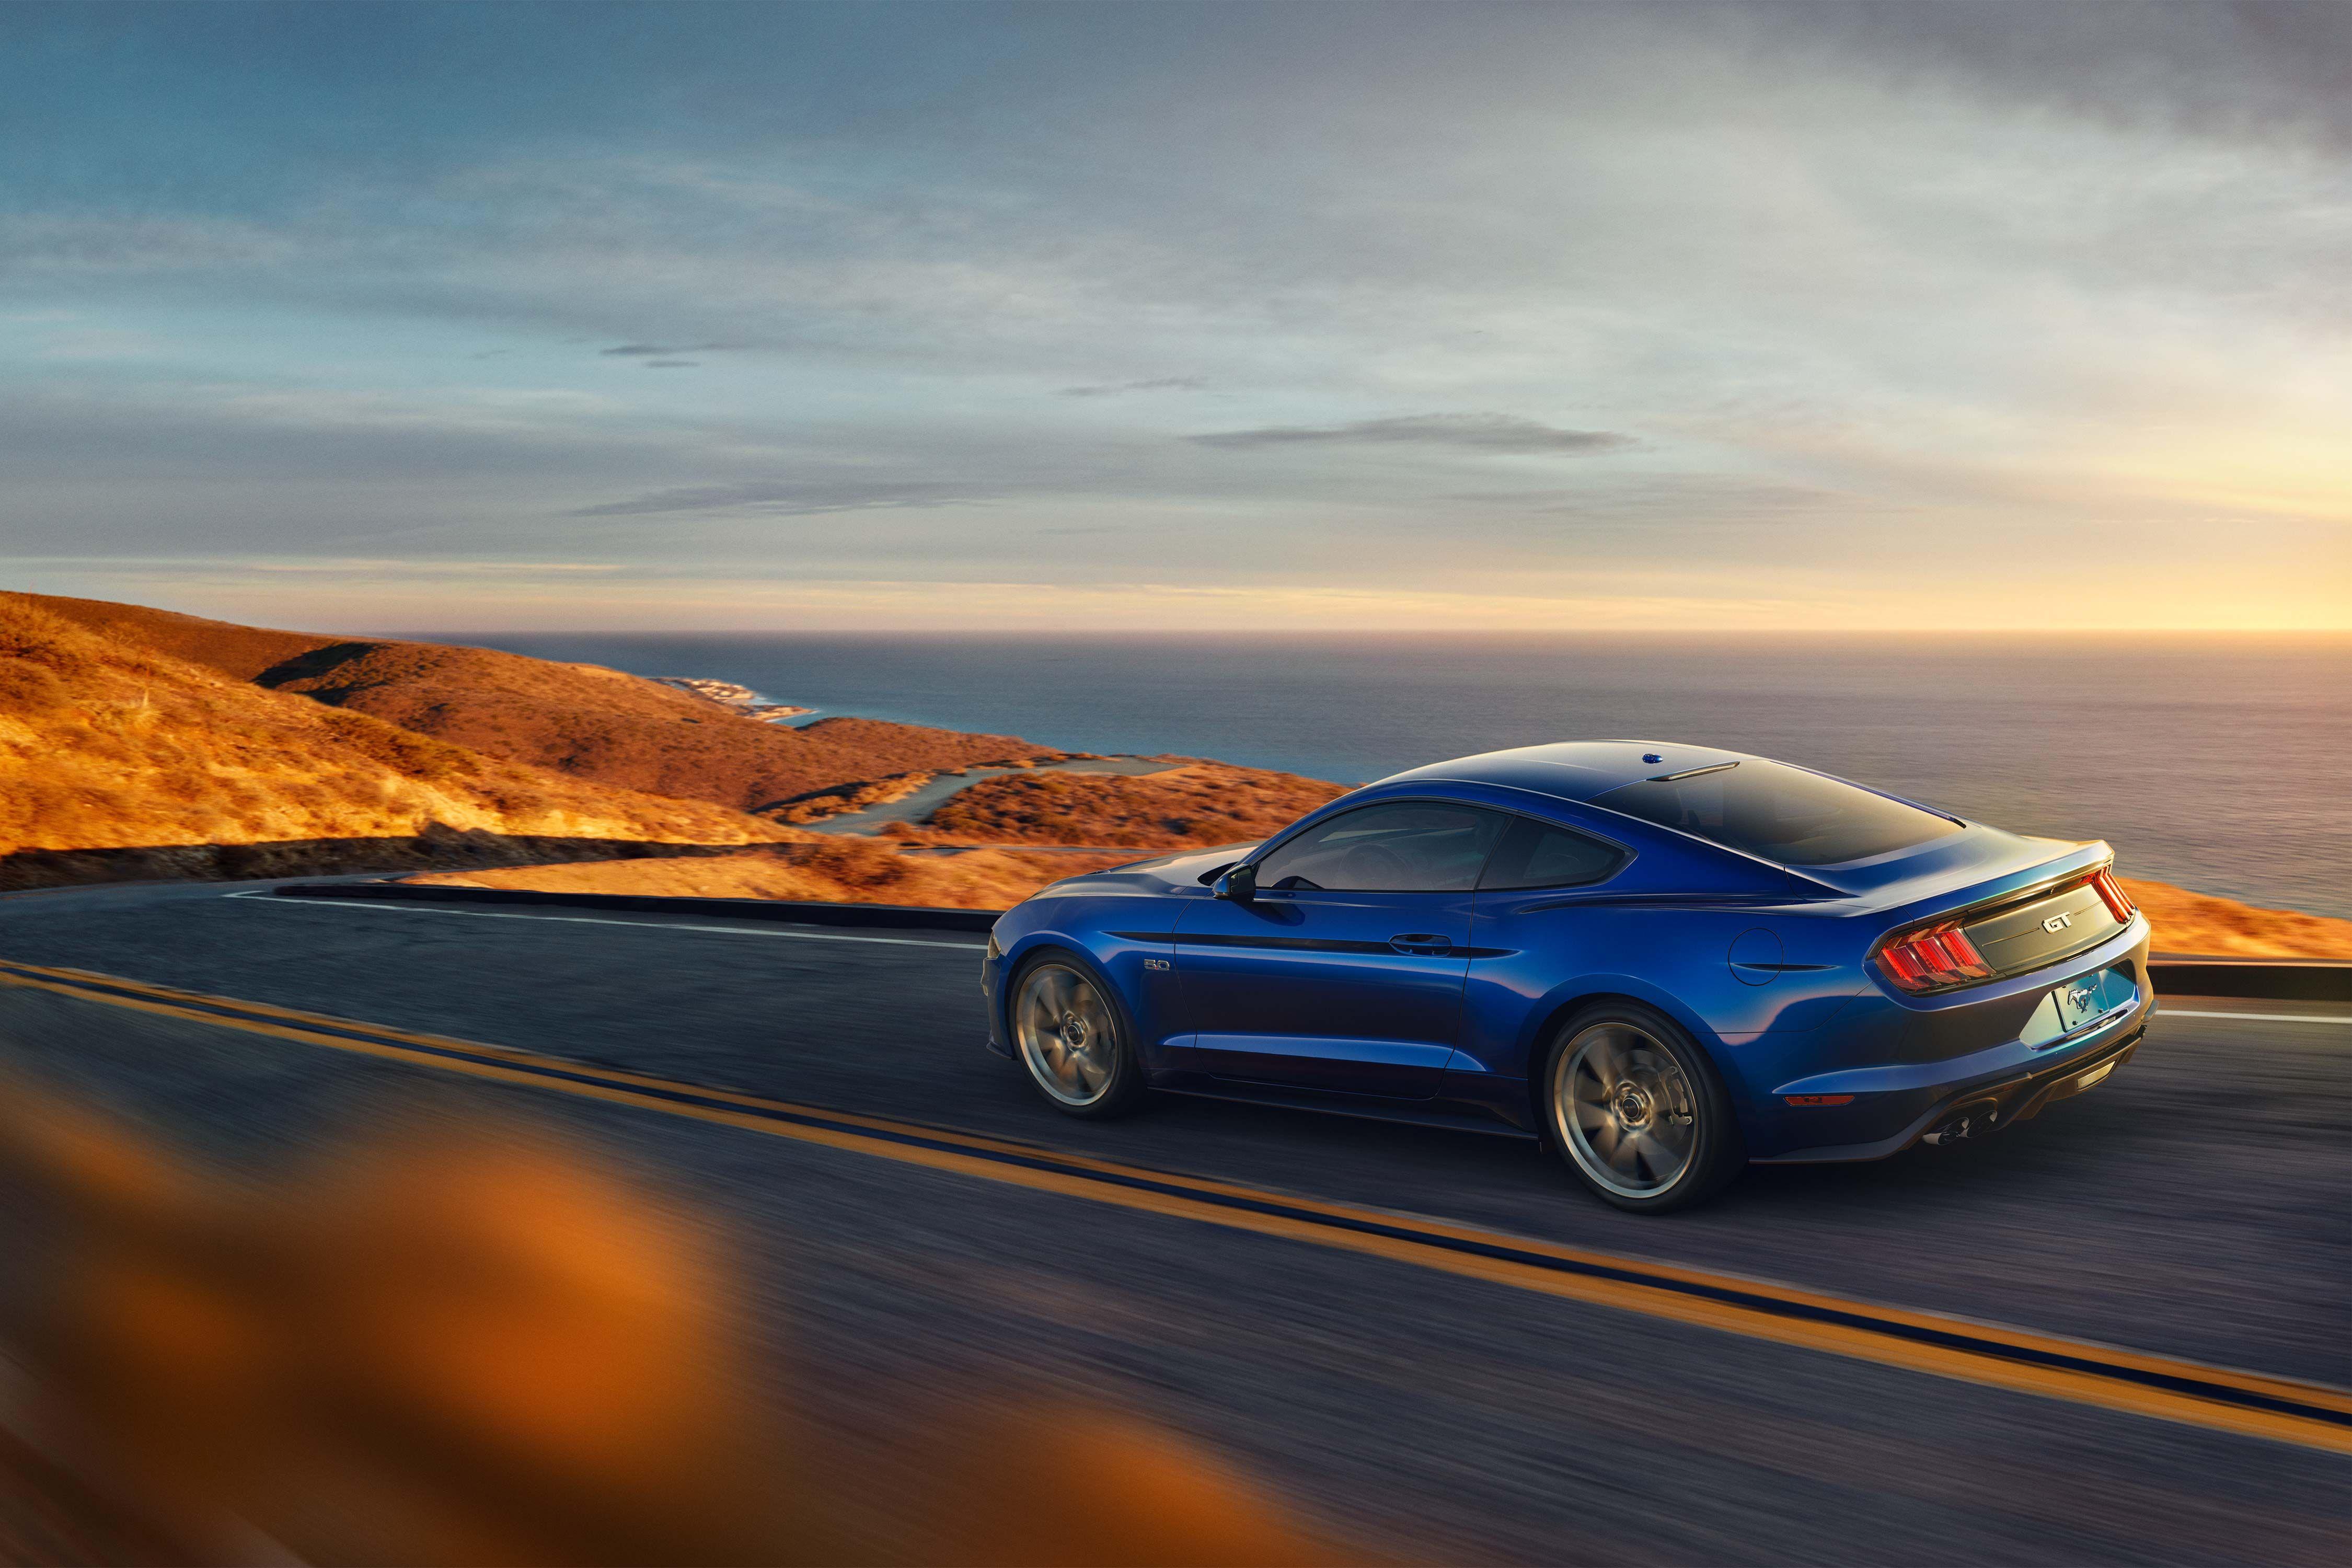 Ford #Mustang #Sports Car 2018 @dubaiposter #buyandsellusedcarsdubai ...